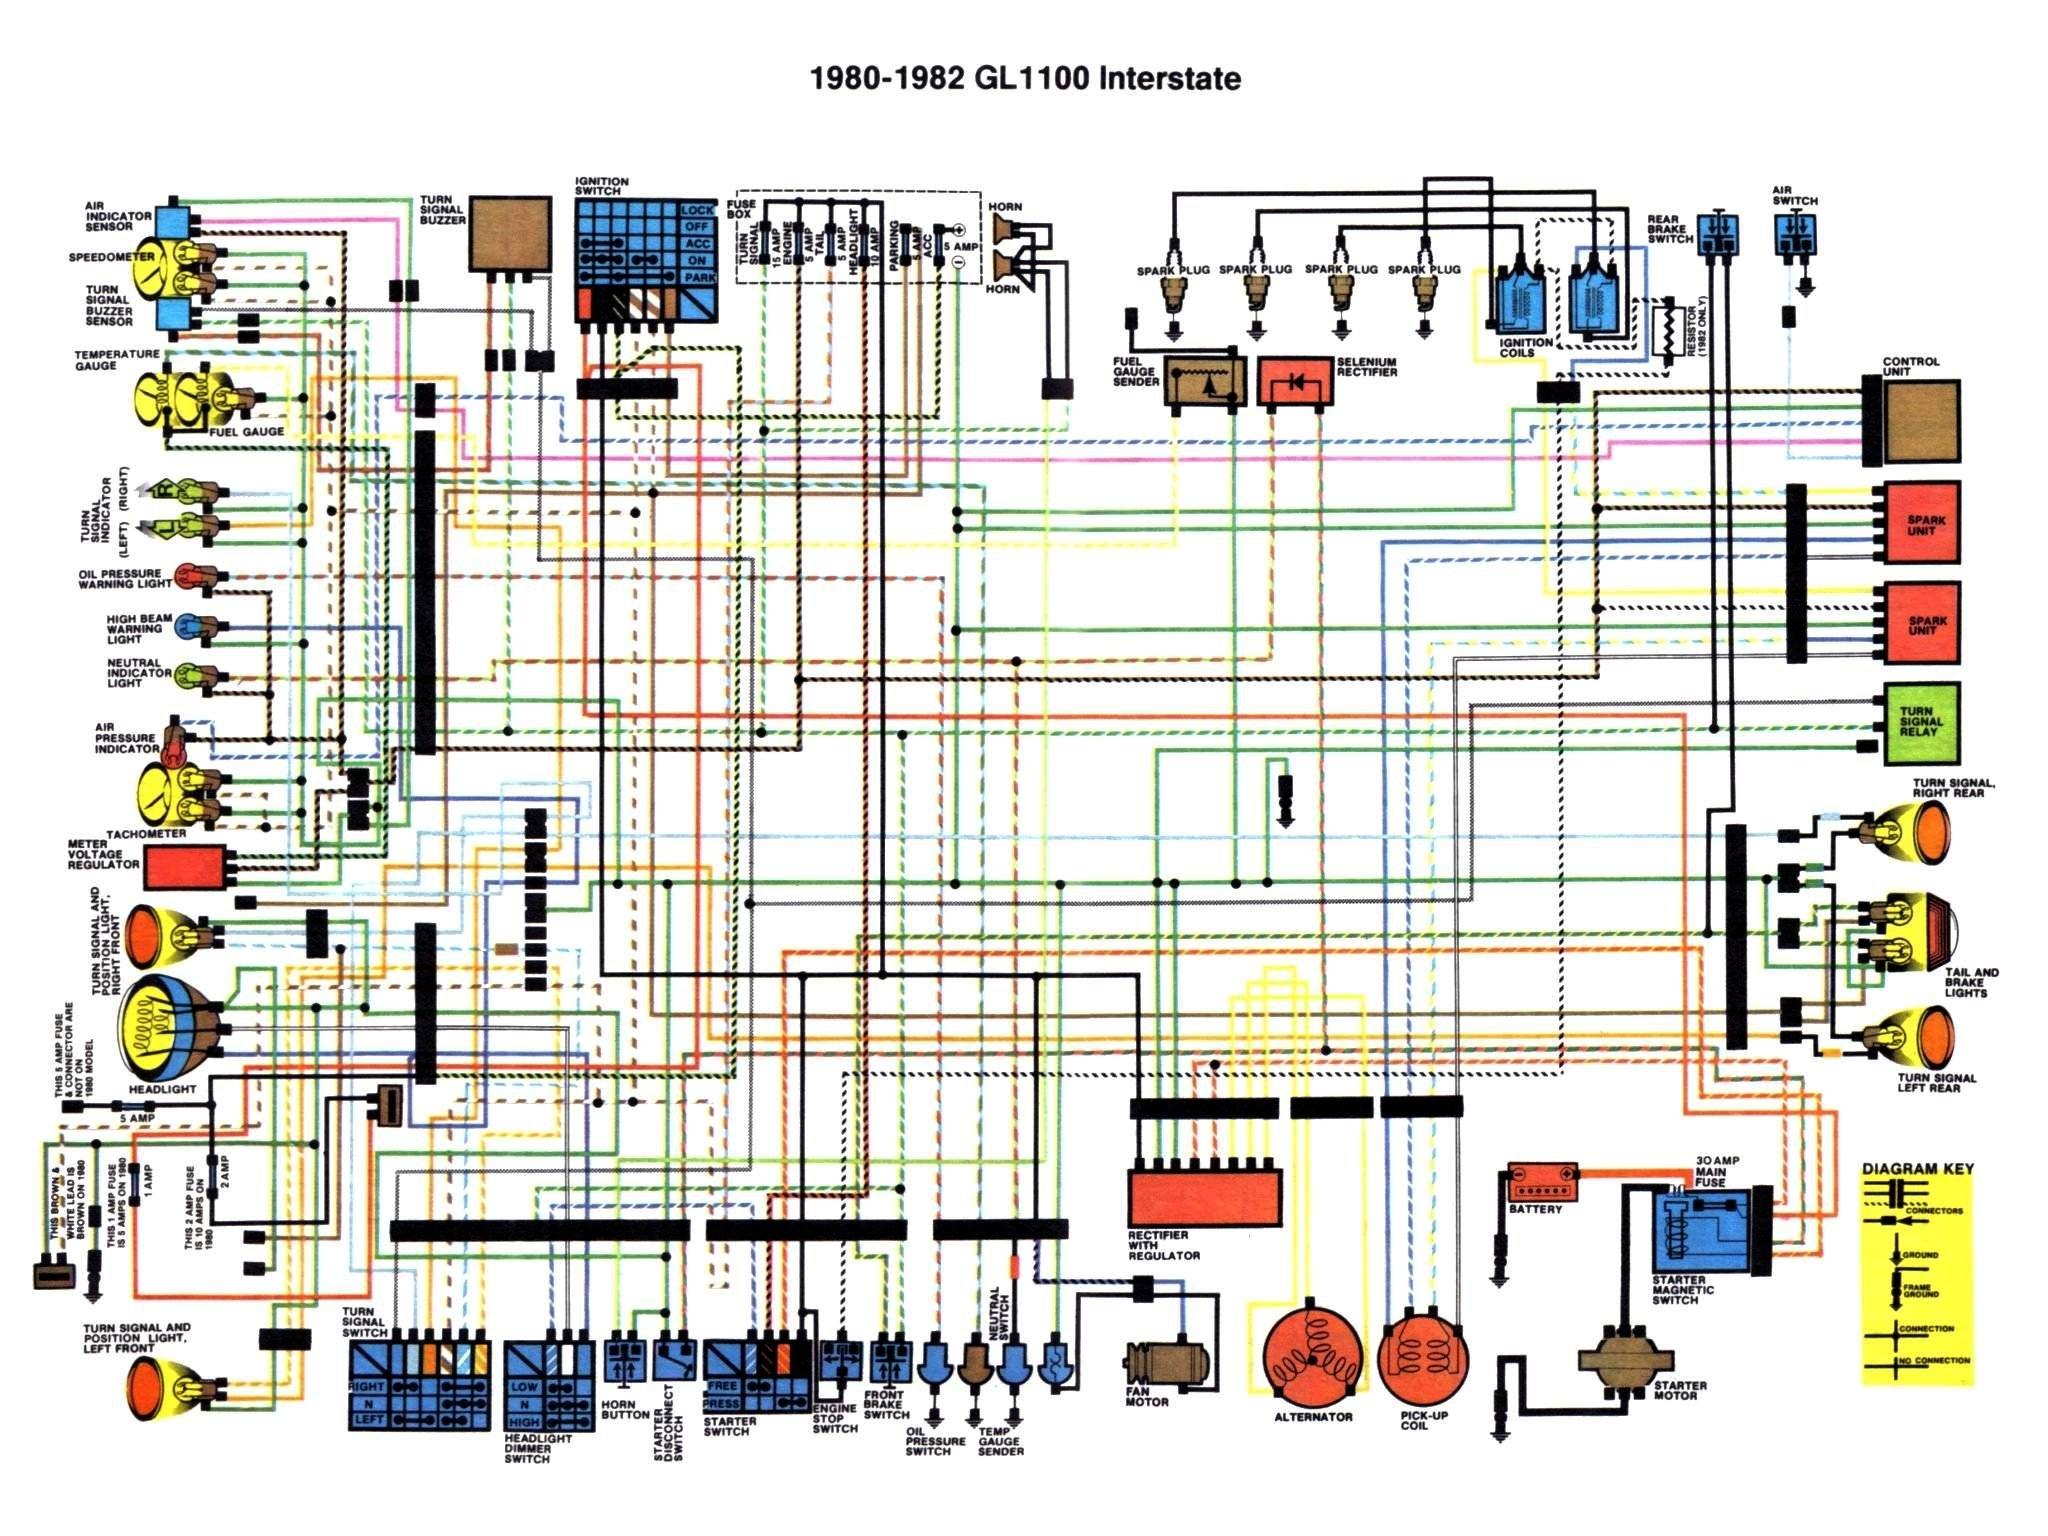 1985 Honda Gl1200 Wiring Diagram - 2015 Jeep Wrangler Fuel Filter for Wiring  Diagram SchematicsWiring Diagram Schematics